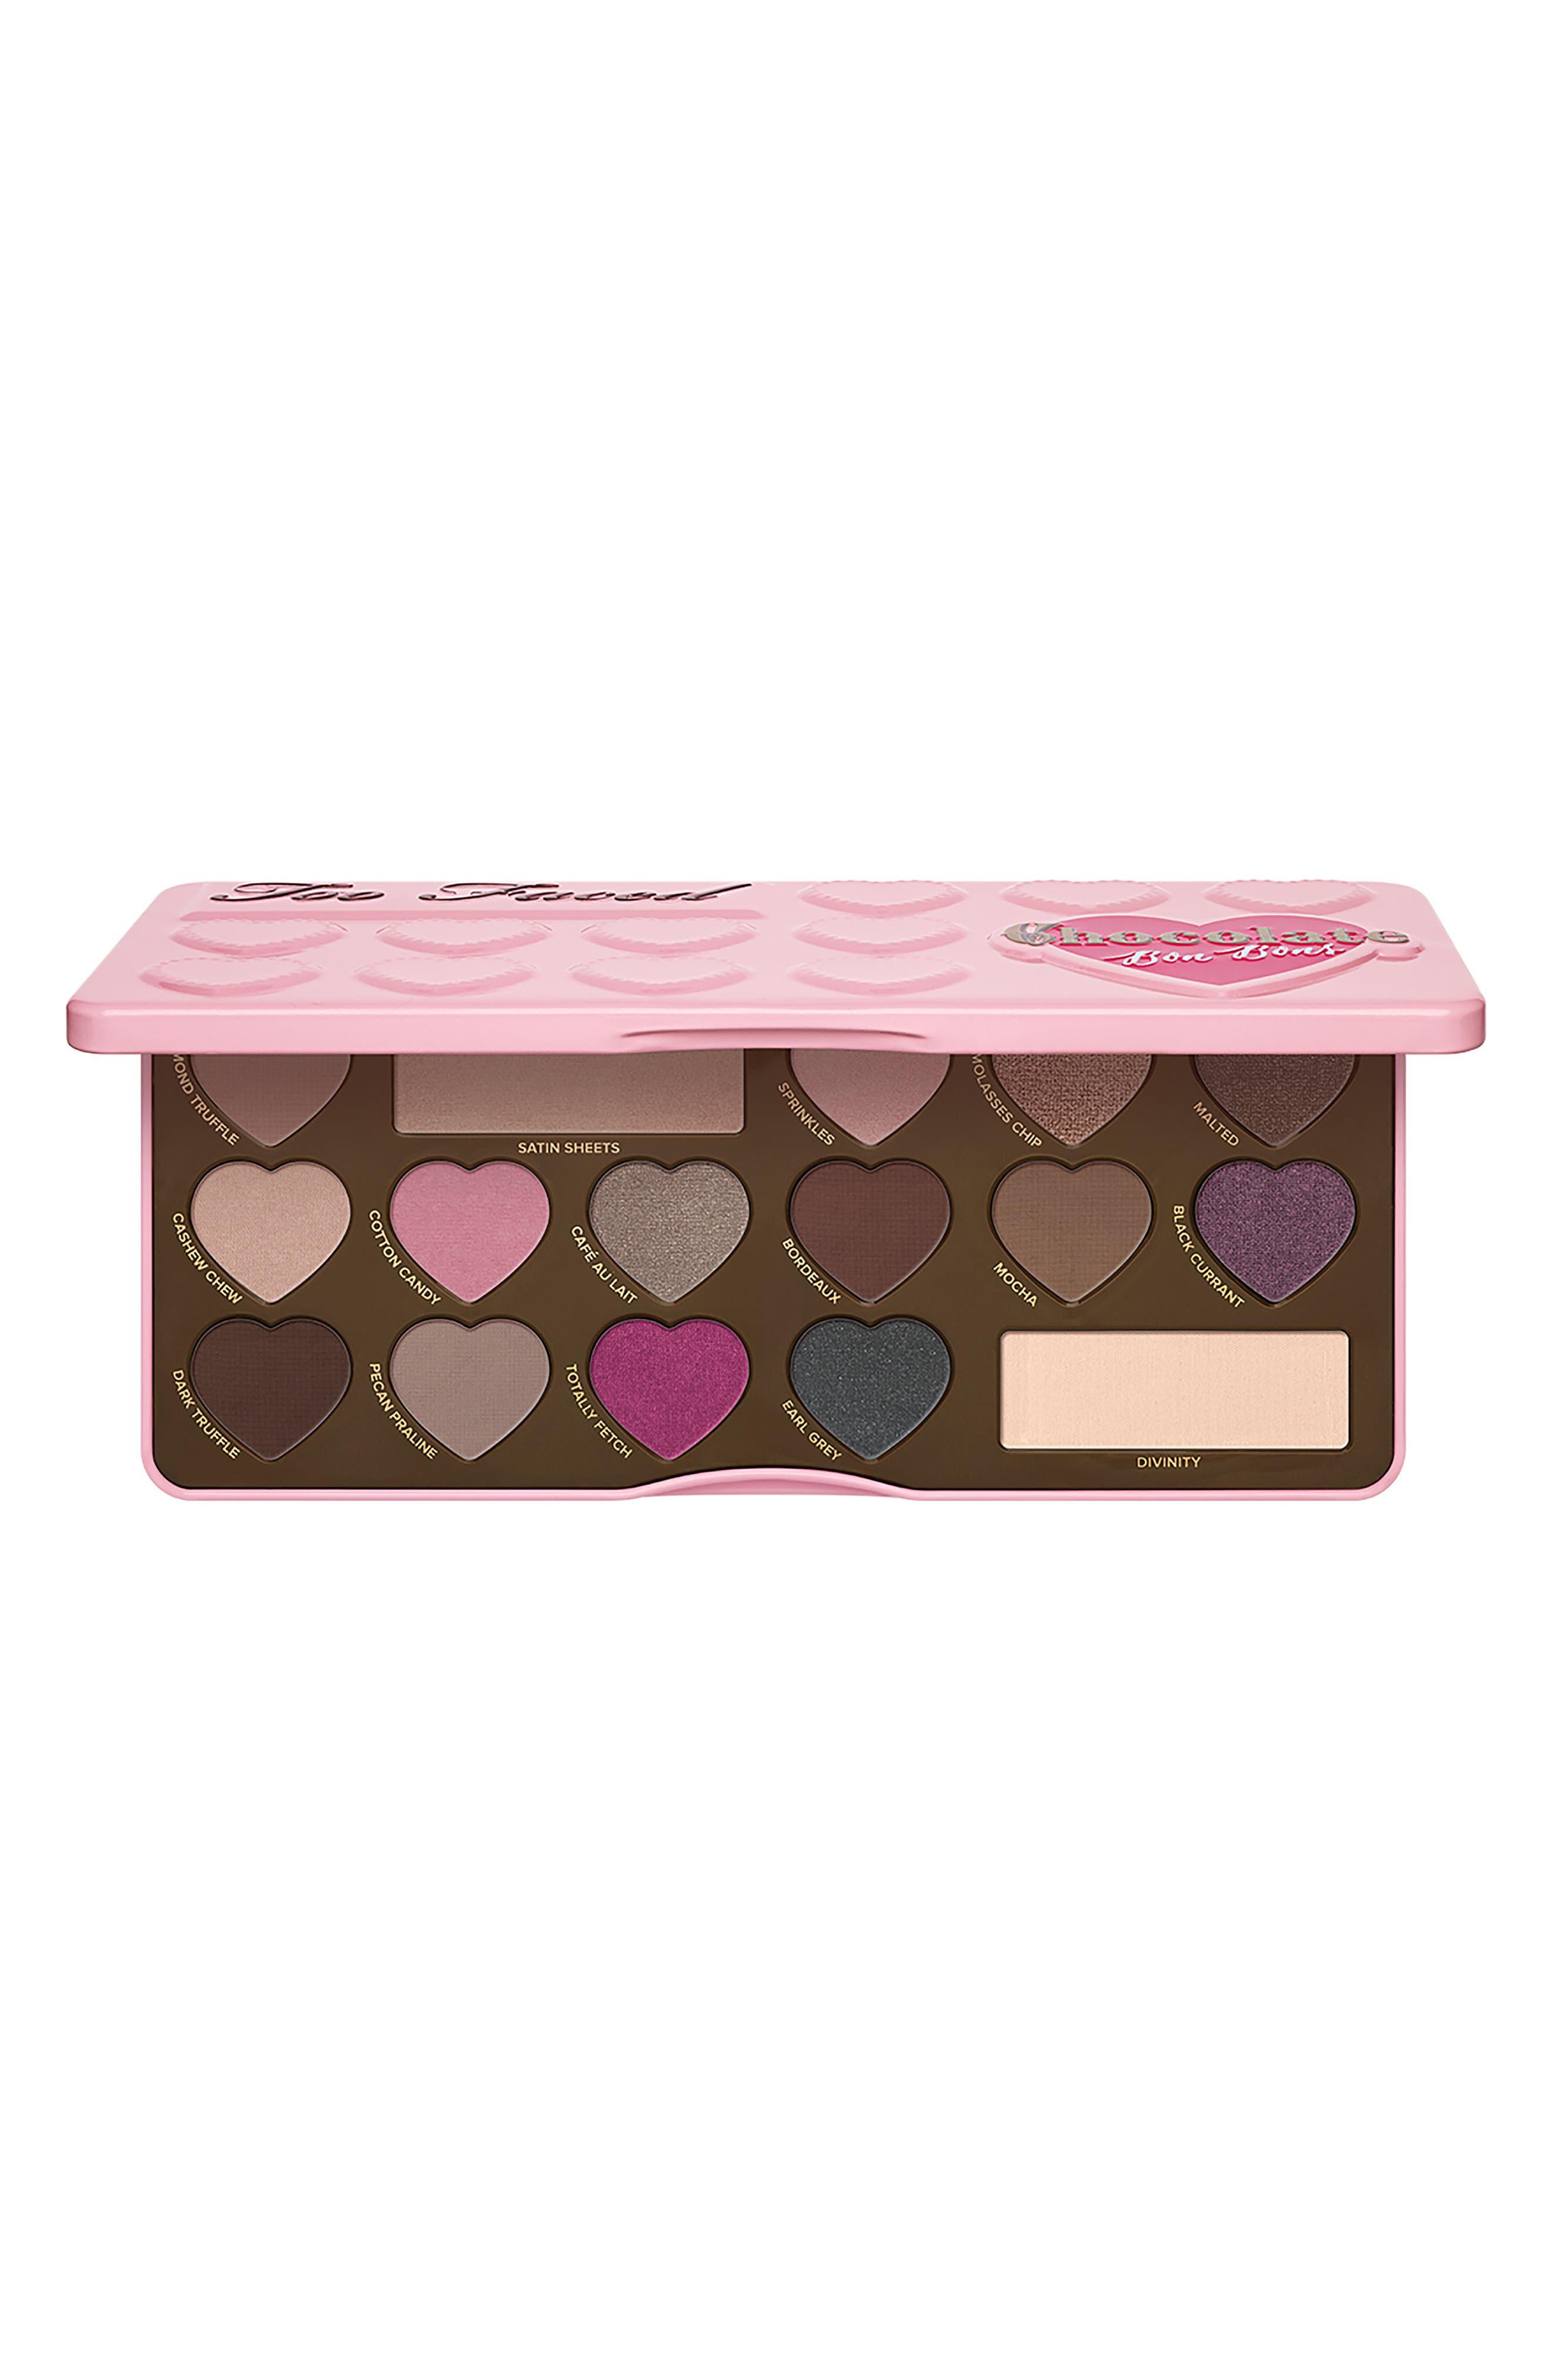 Chocolate Bon Bons Eyeshadow Palette,                         Main,                         color, No Color